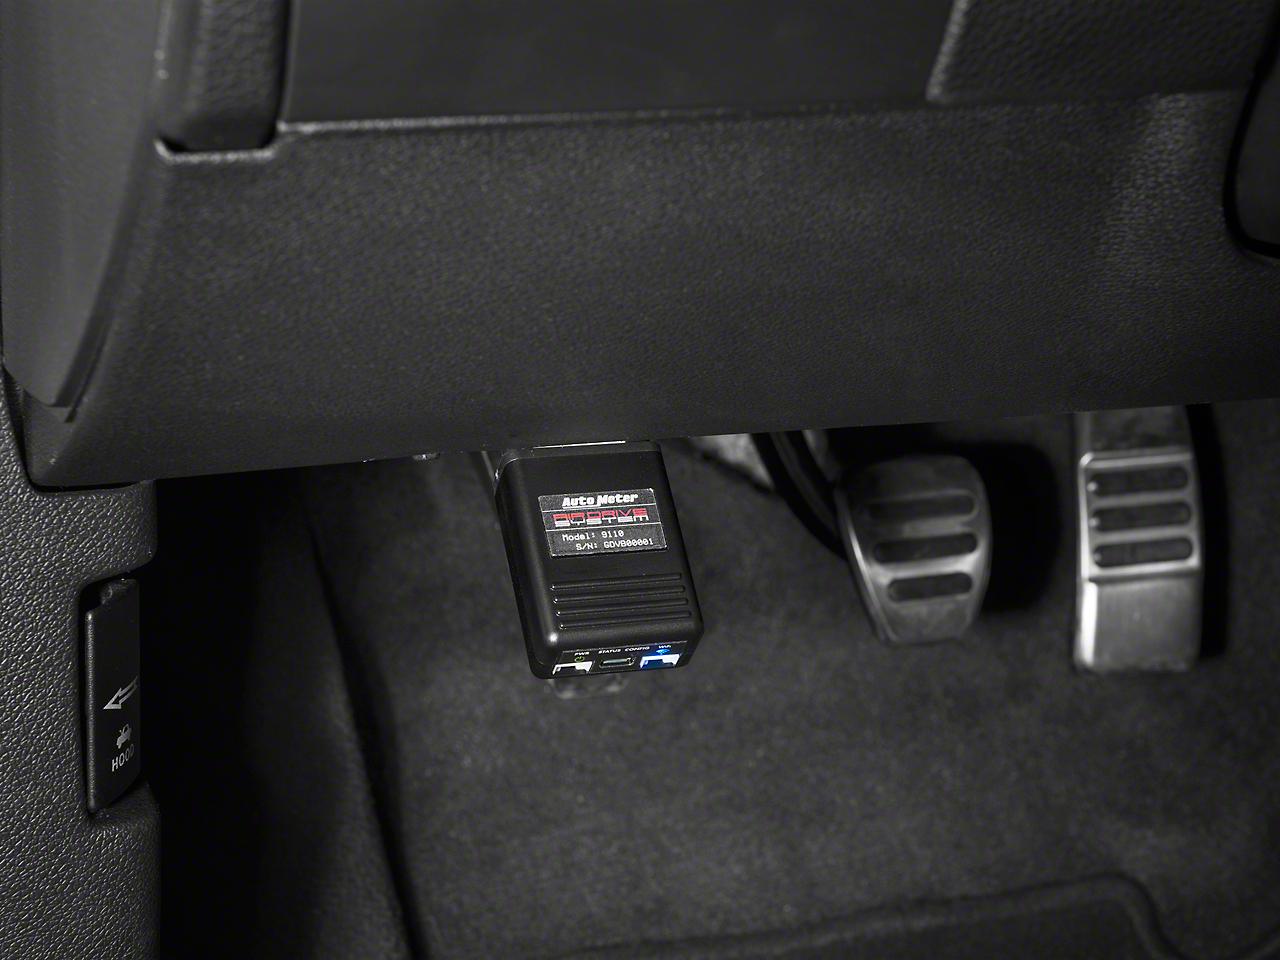 Auto Meter AirDrive WiFi OBD-II Control Module (96-17 All)